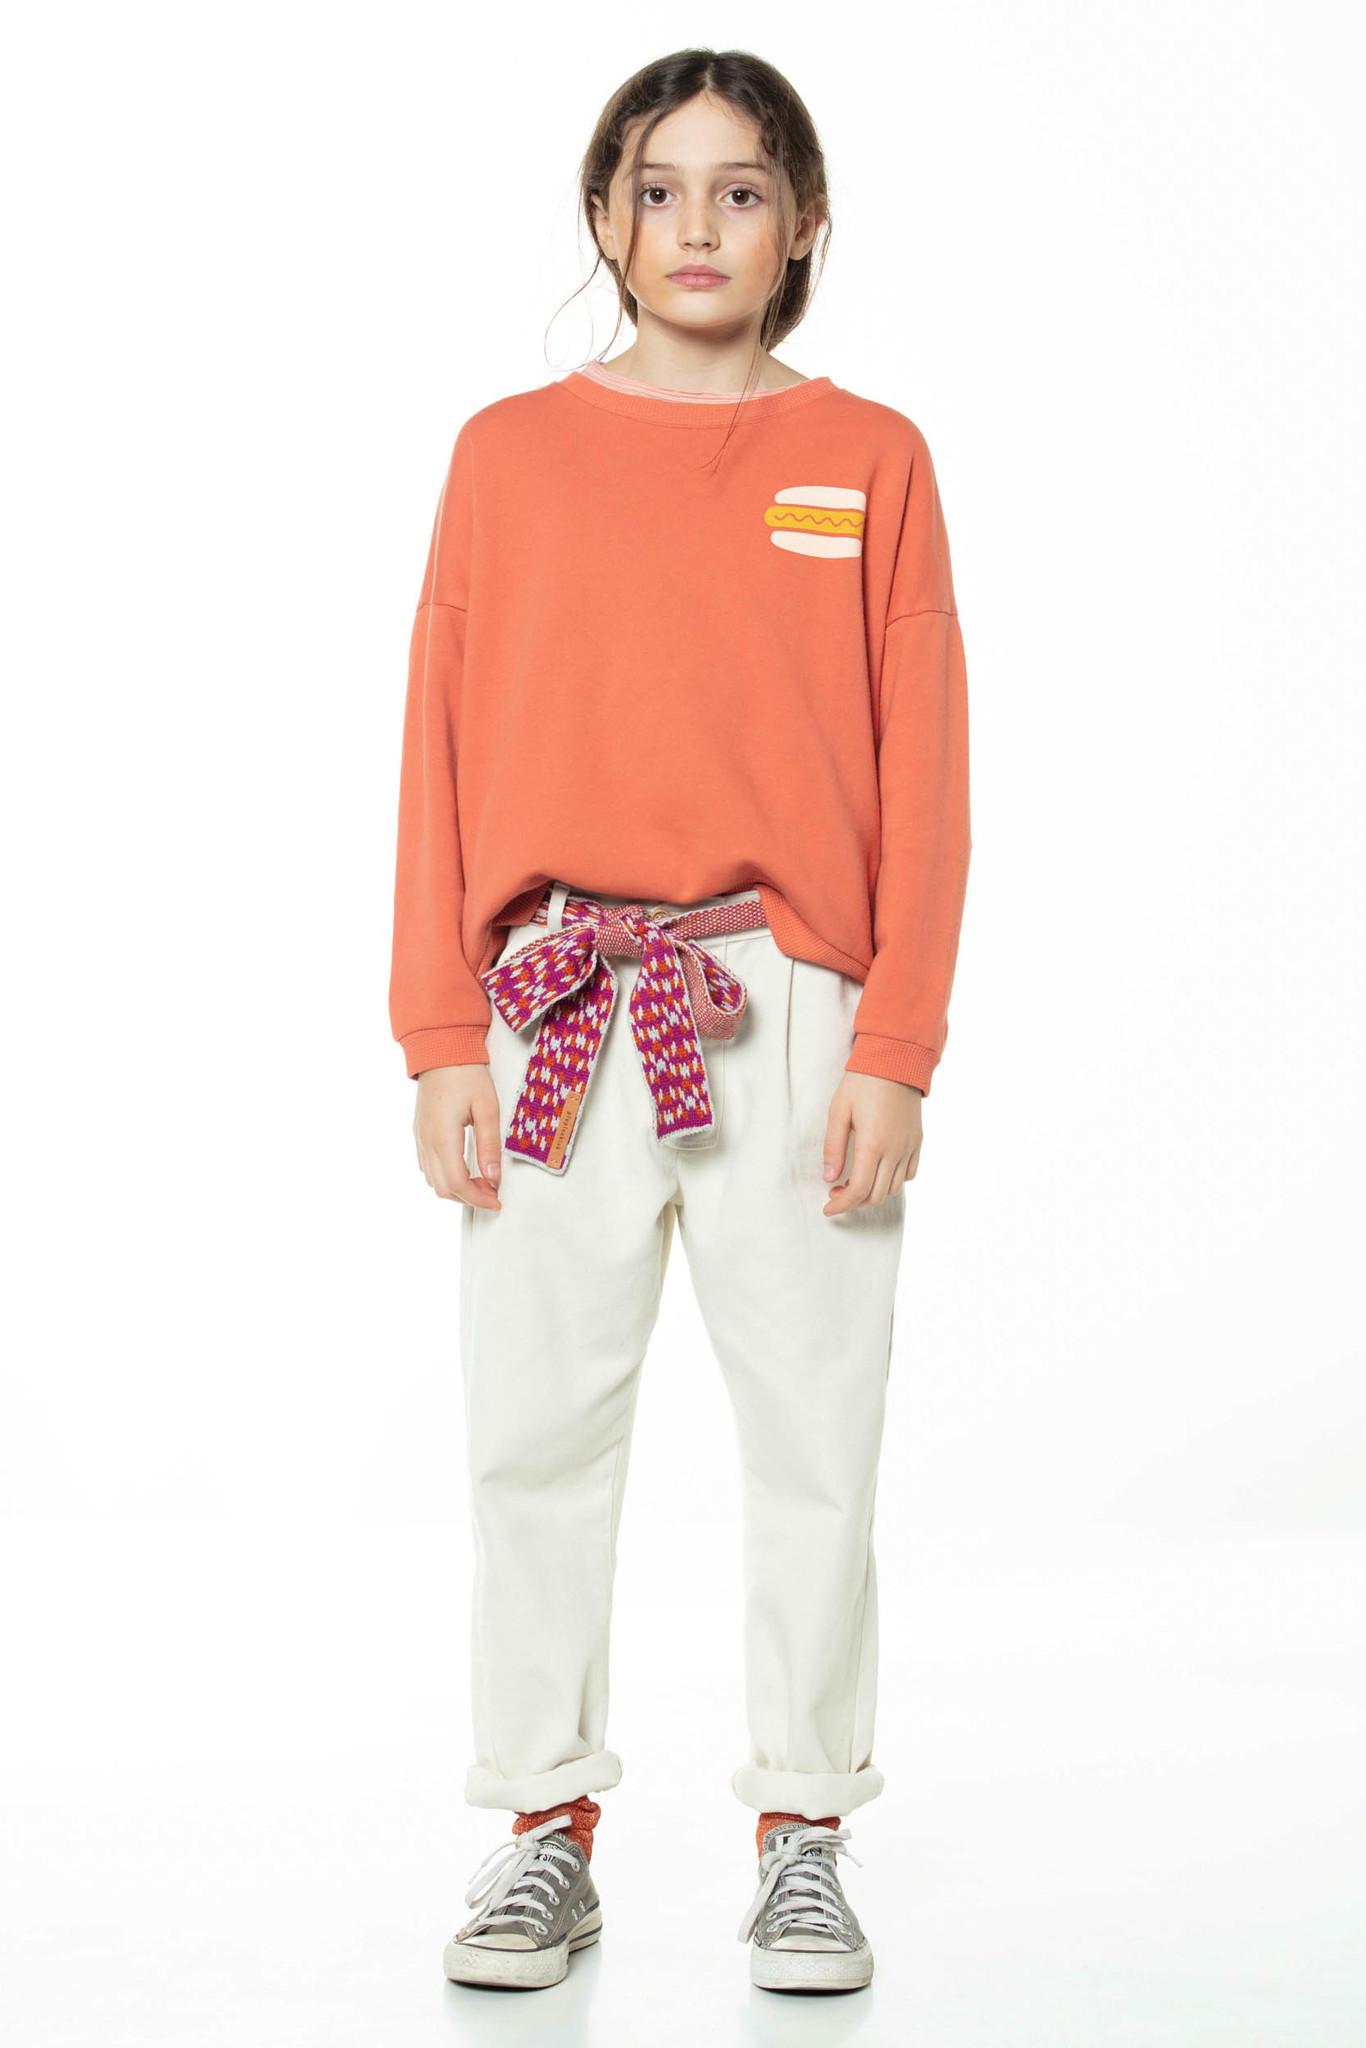 piupiuchick Unisex sweatshirt | brick w/ hot dog print